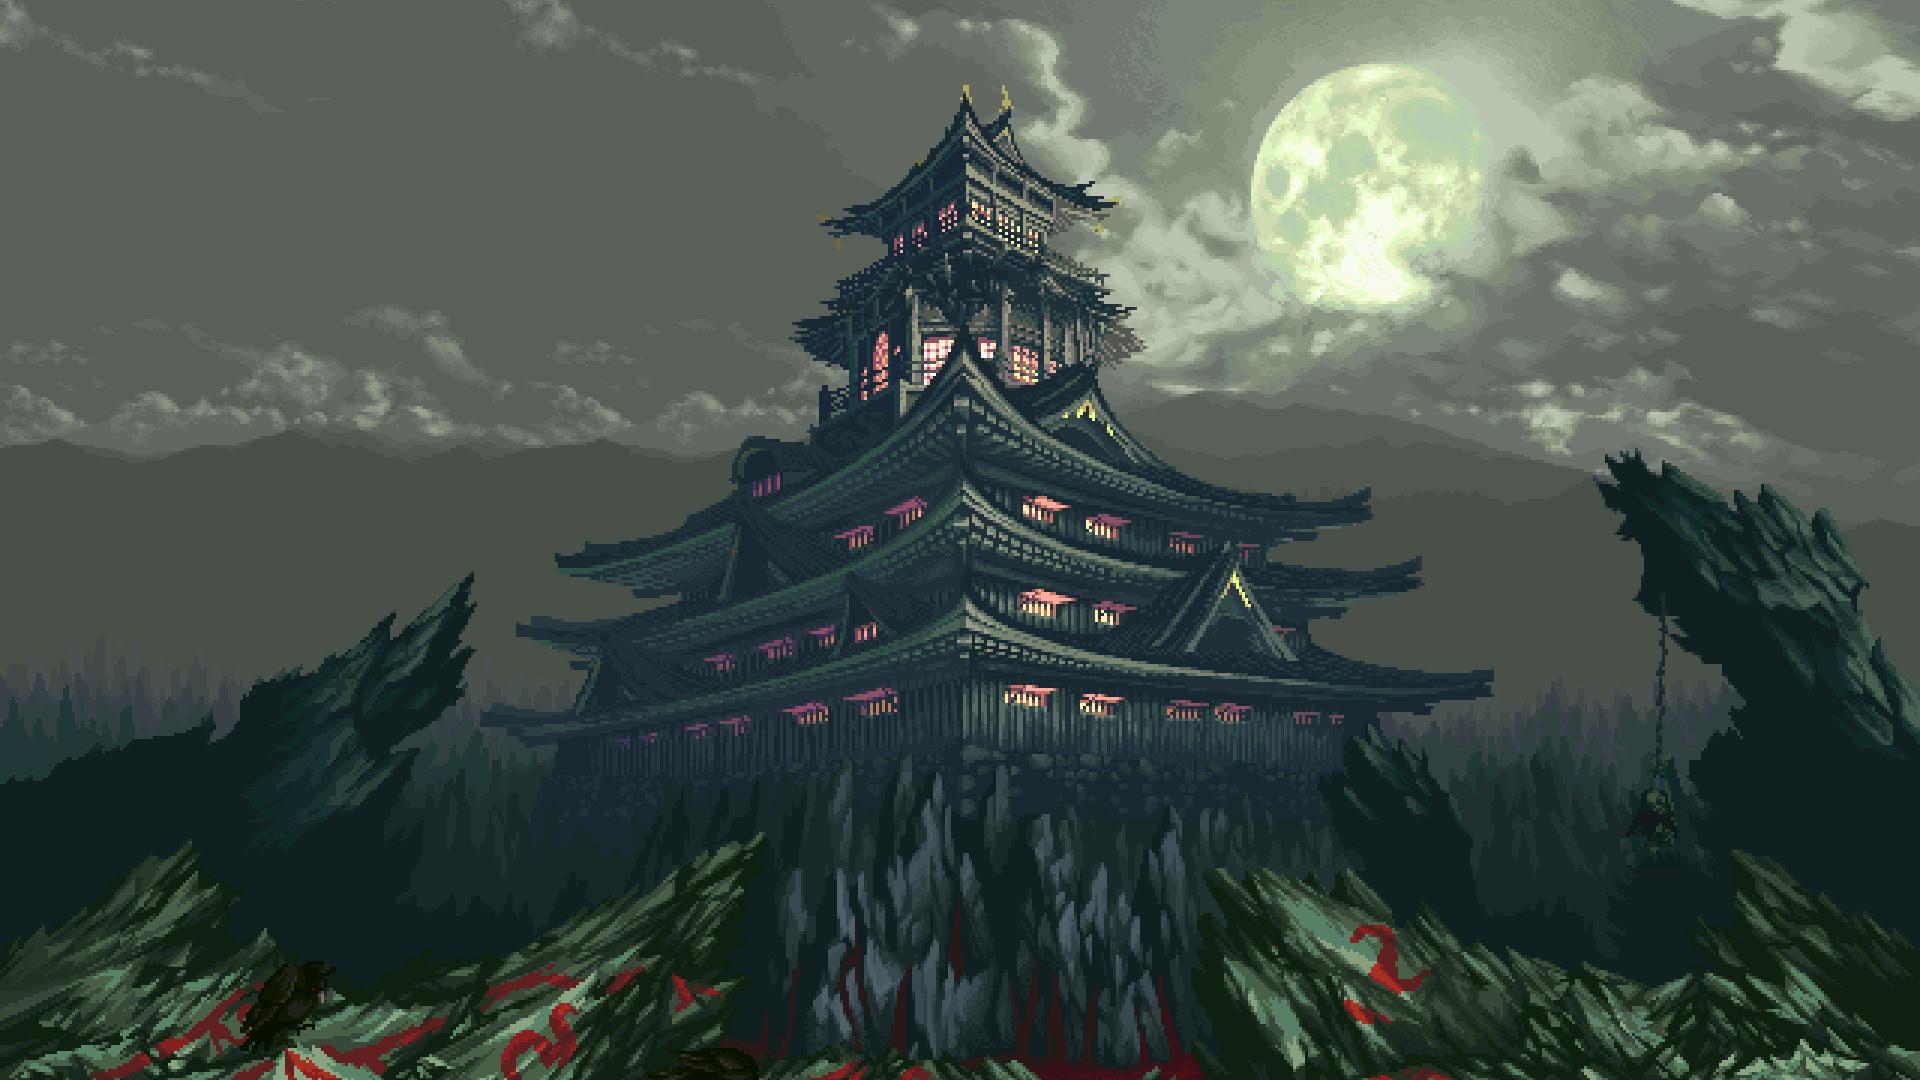 Res: 1920x1080, pixels pixel art 8 bit rock asian architecture house moon clouds wallpaper  and background